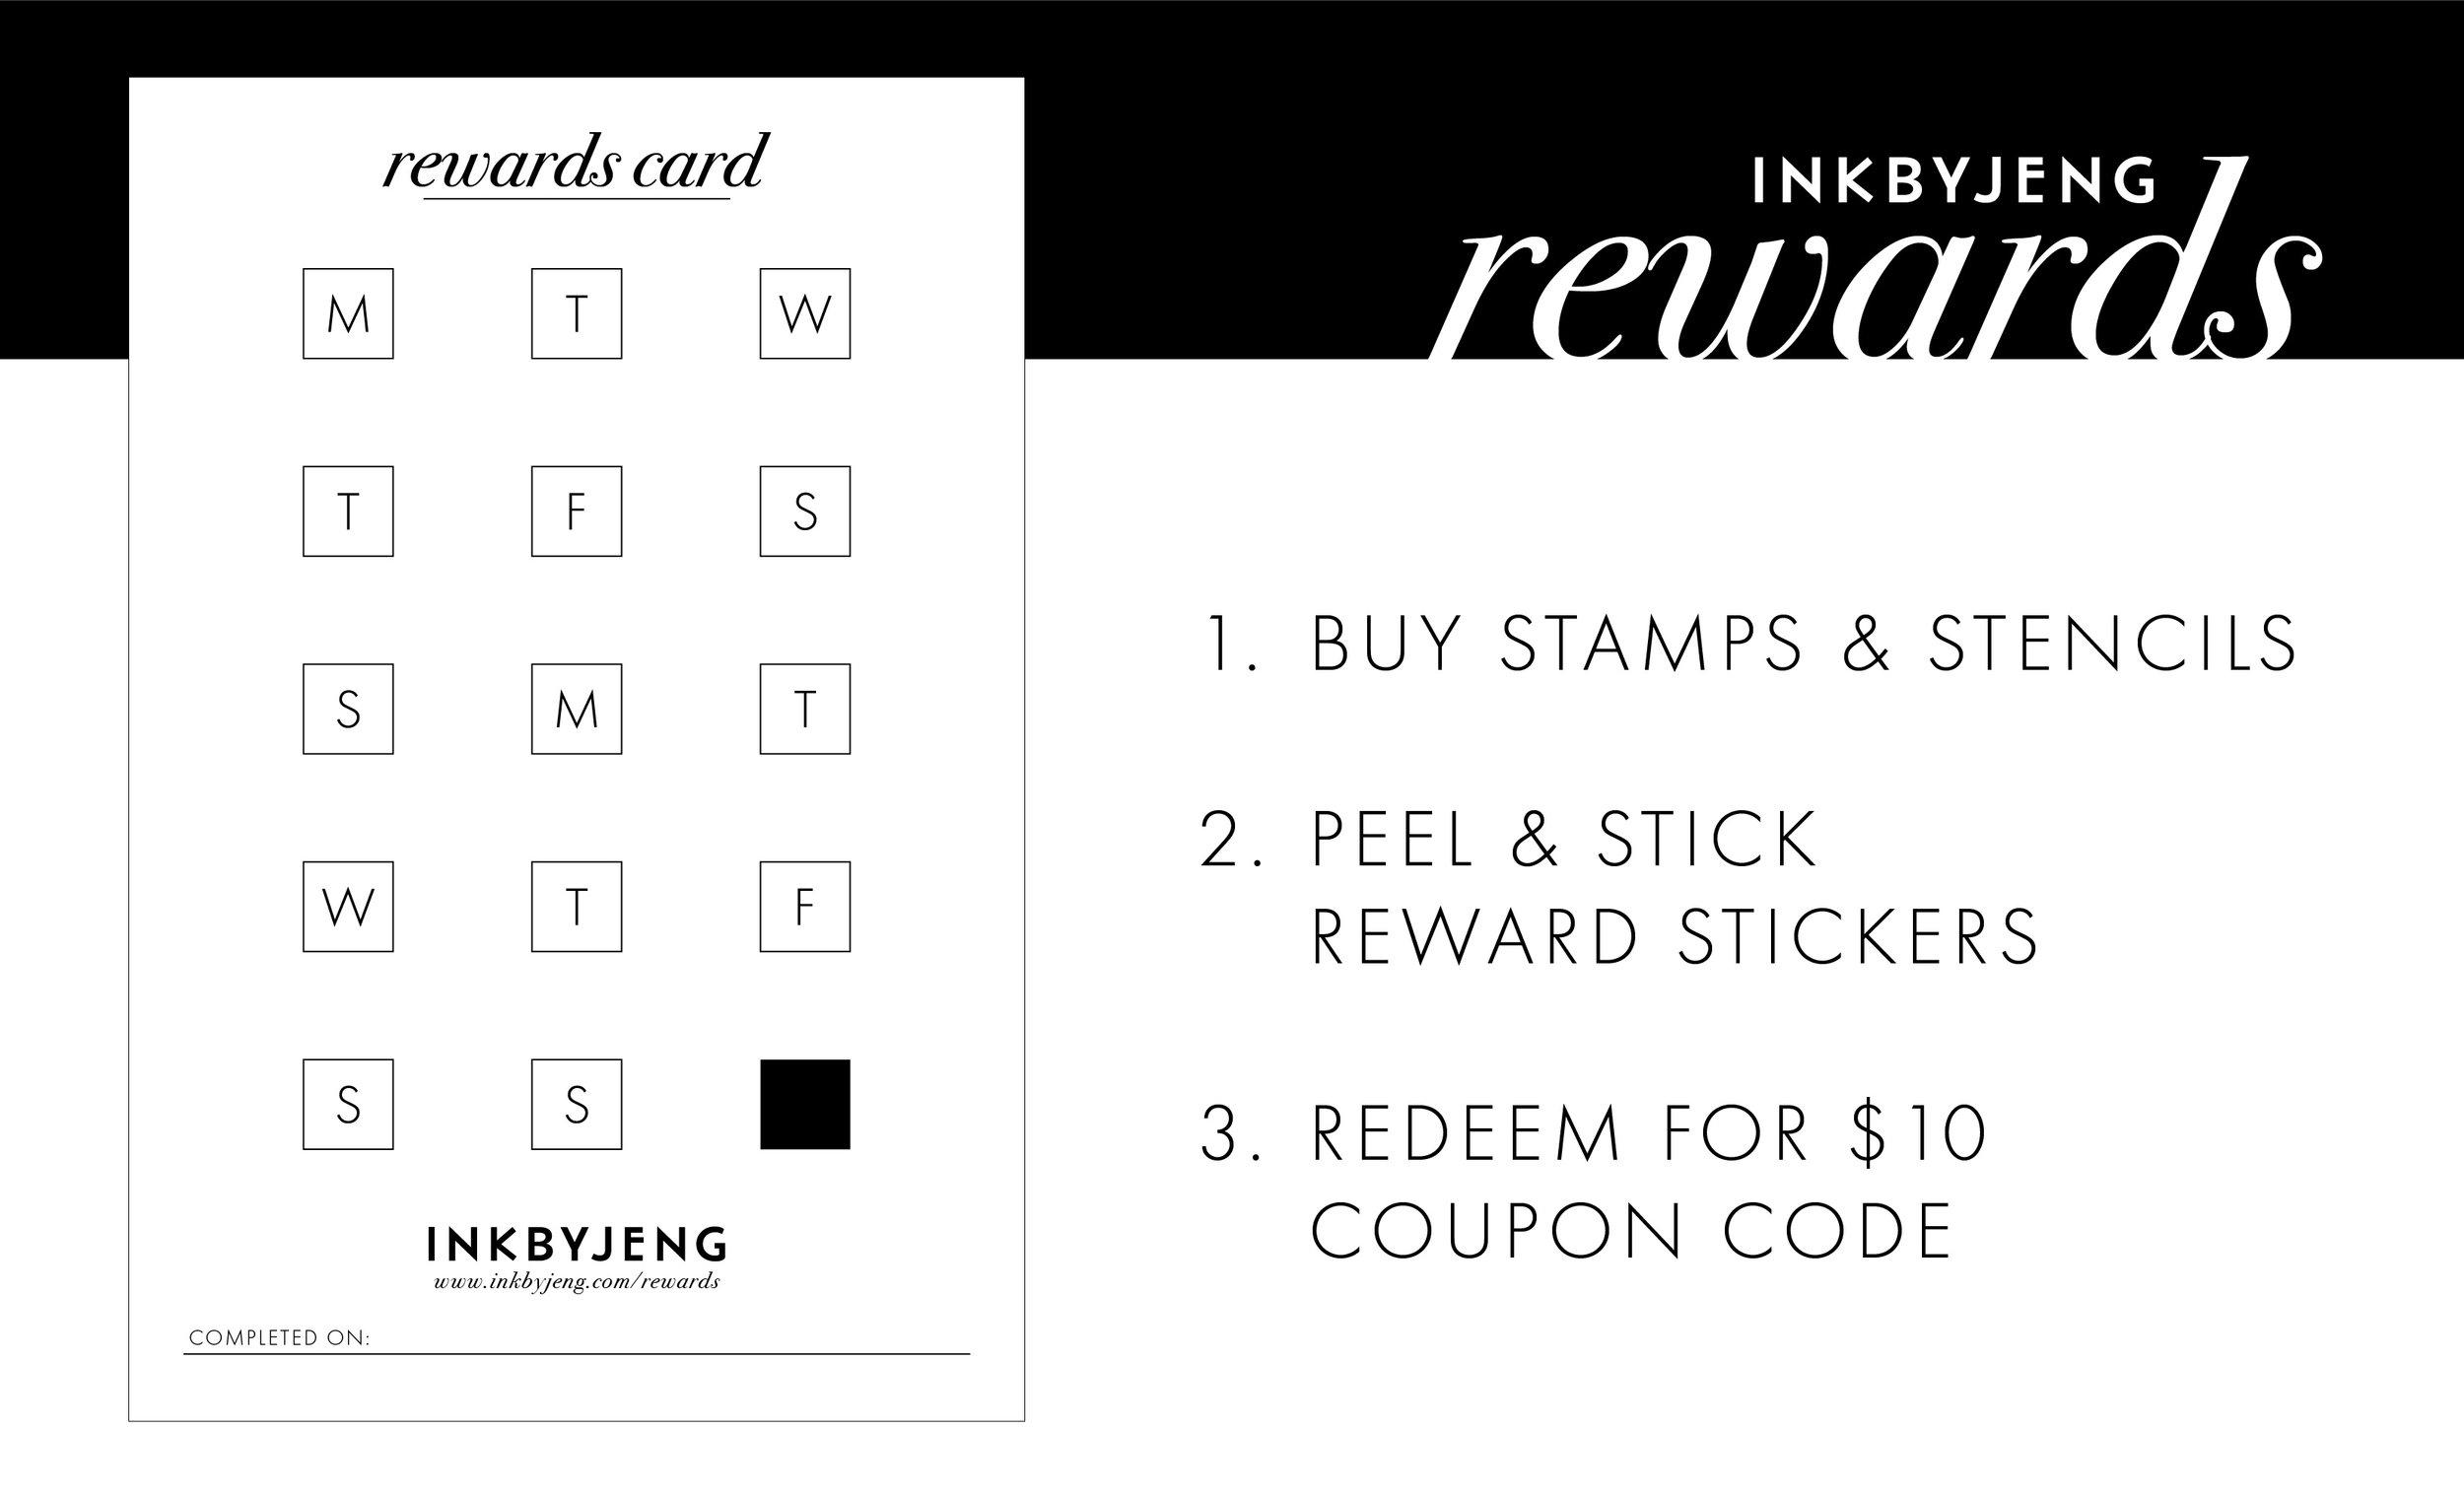 inkbyjeng-rewards-program.jpg